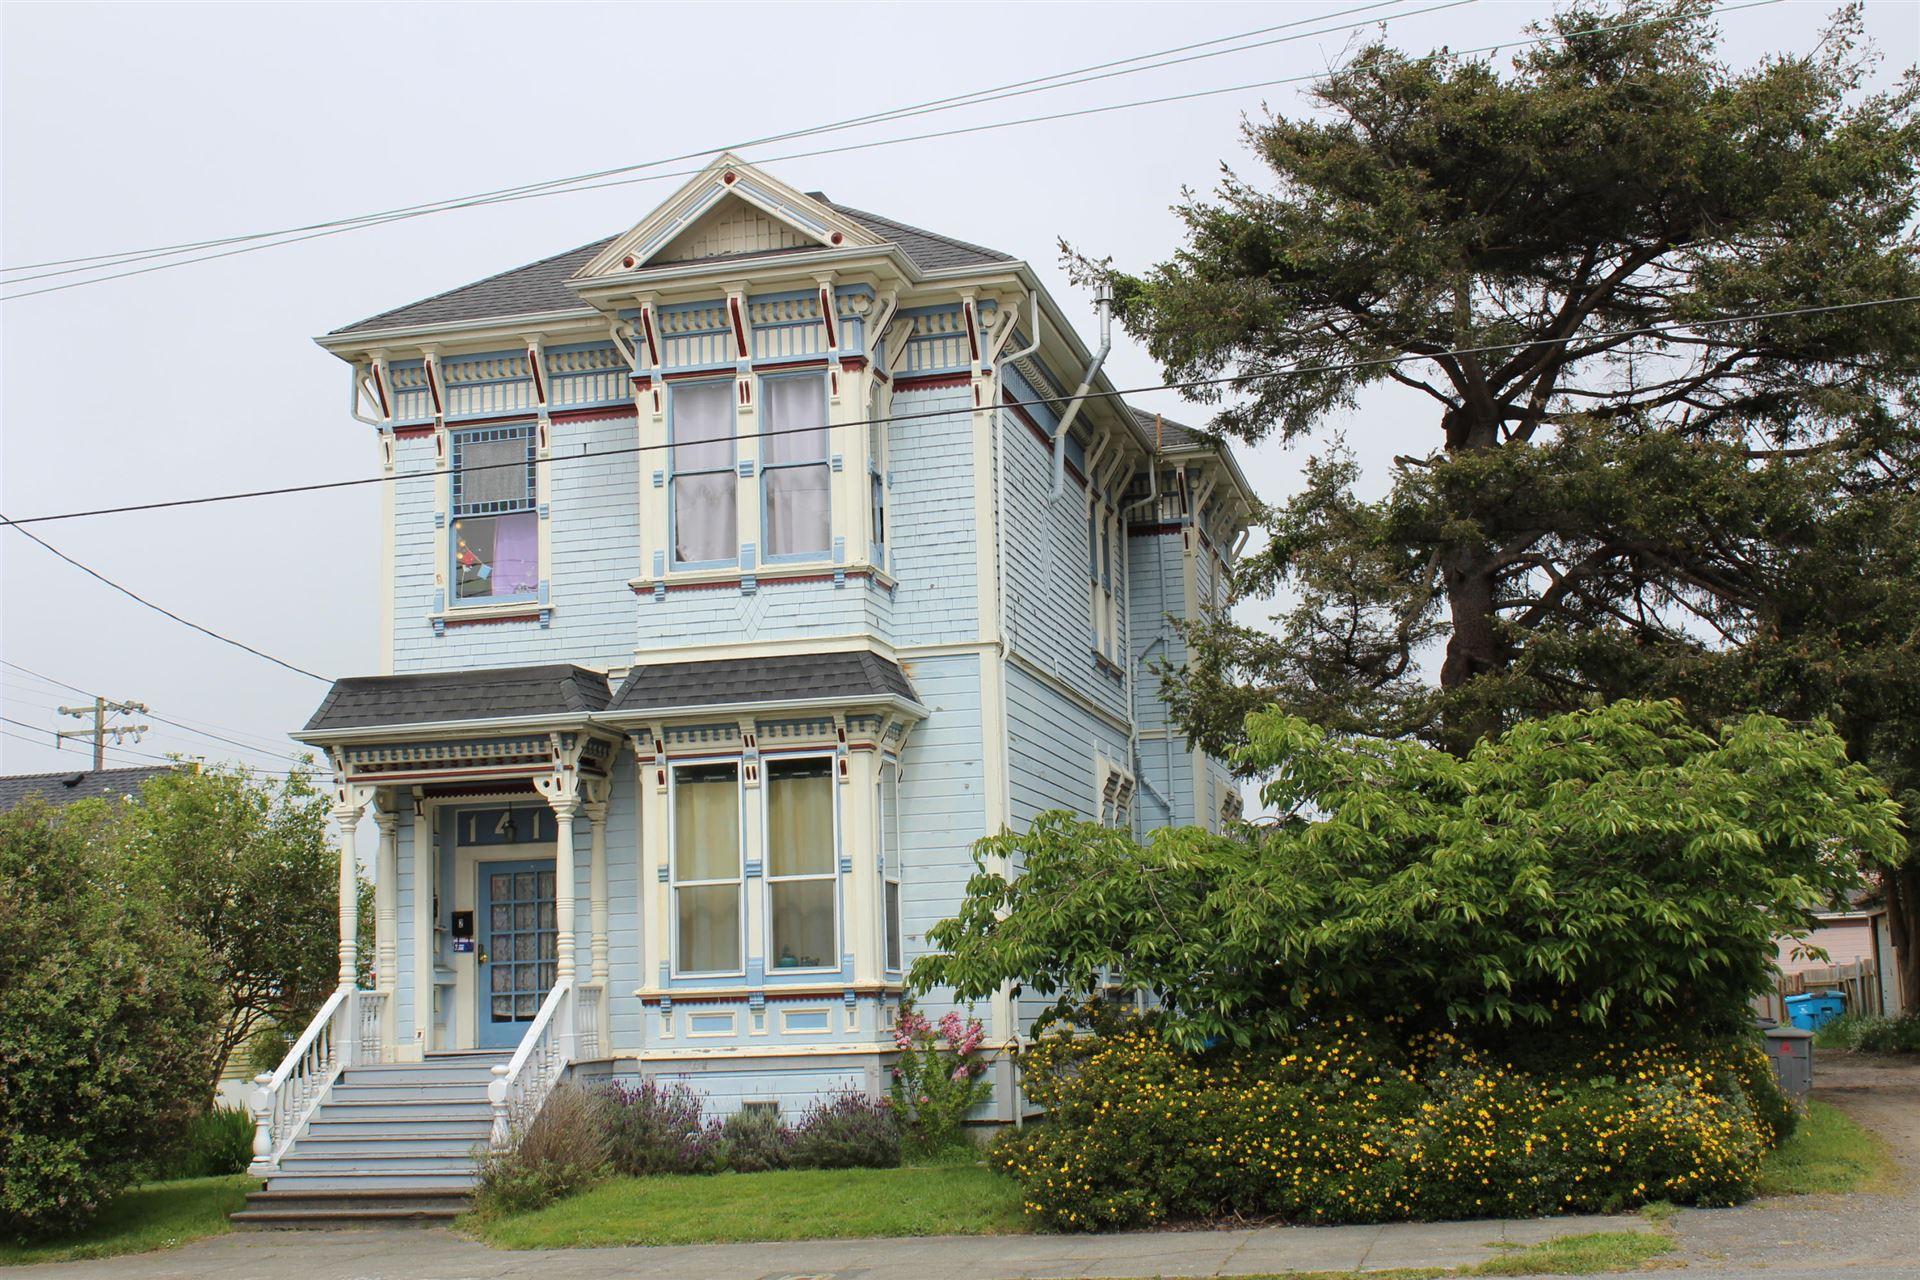 1411 H Street, Eureka, CA 95501 - MLS#: 260193